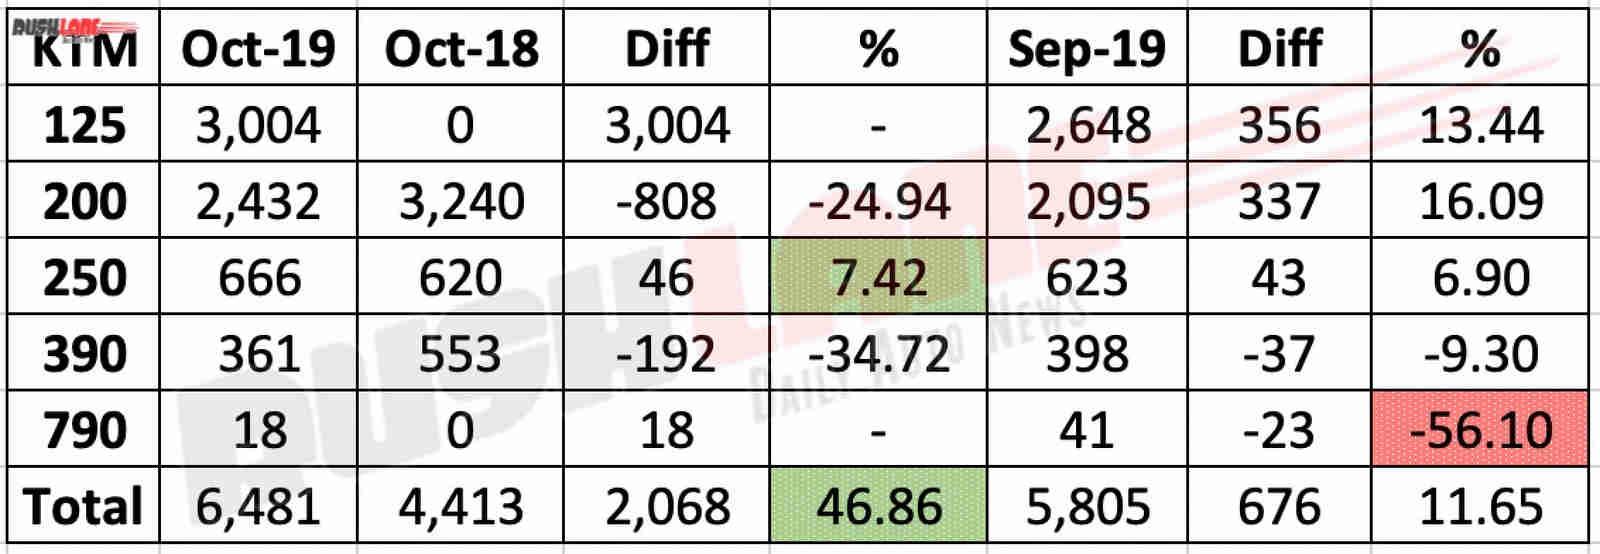 KTM India oct 2019 sales